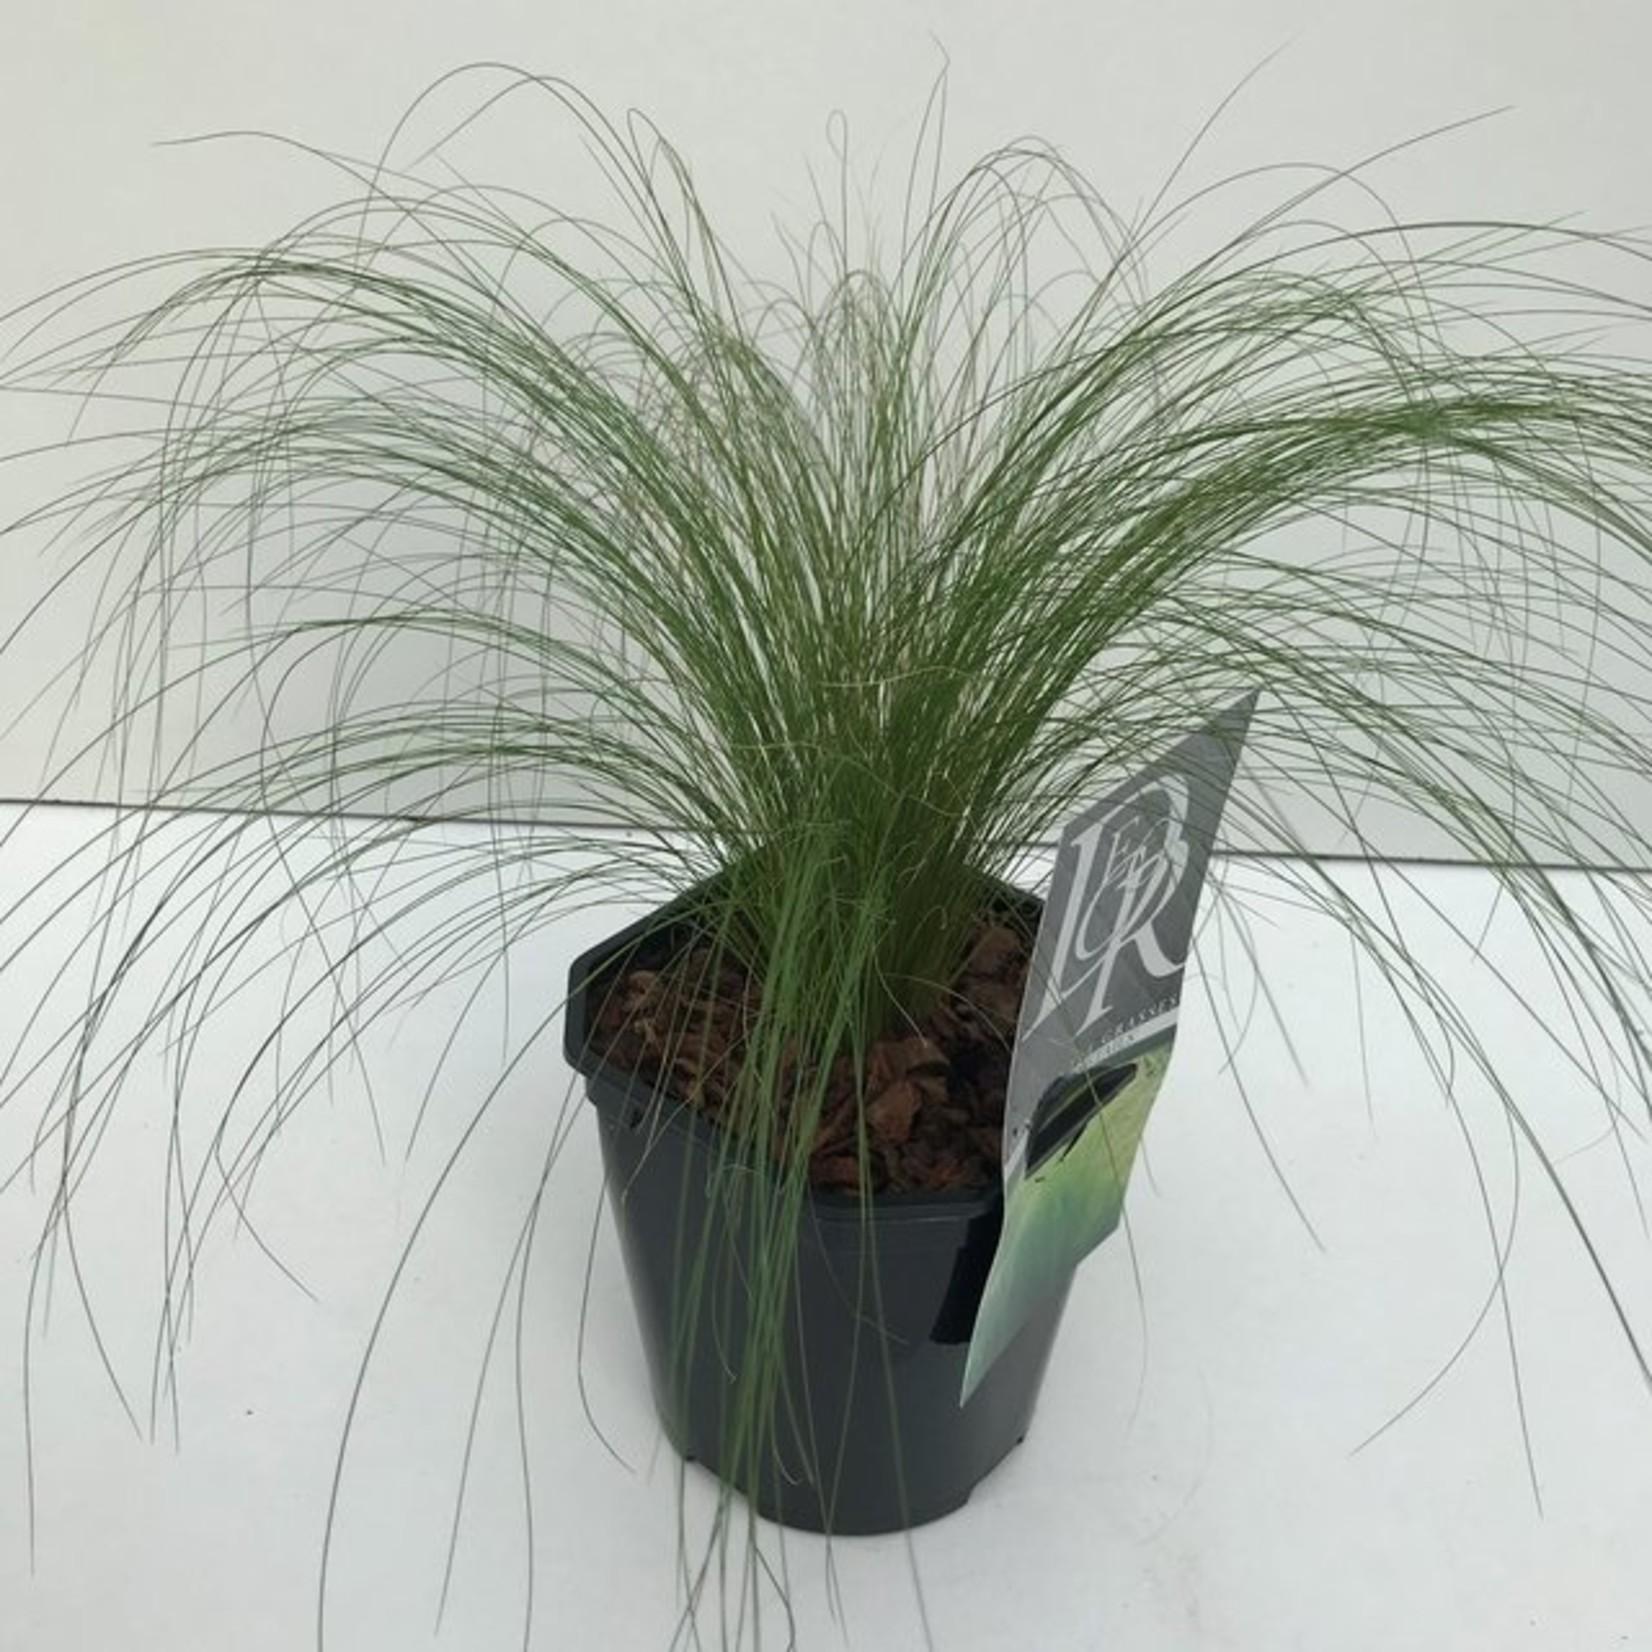 Stipa tenuifolia 'Ponytails' (Vedergras)